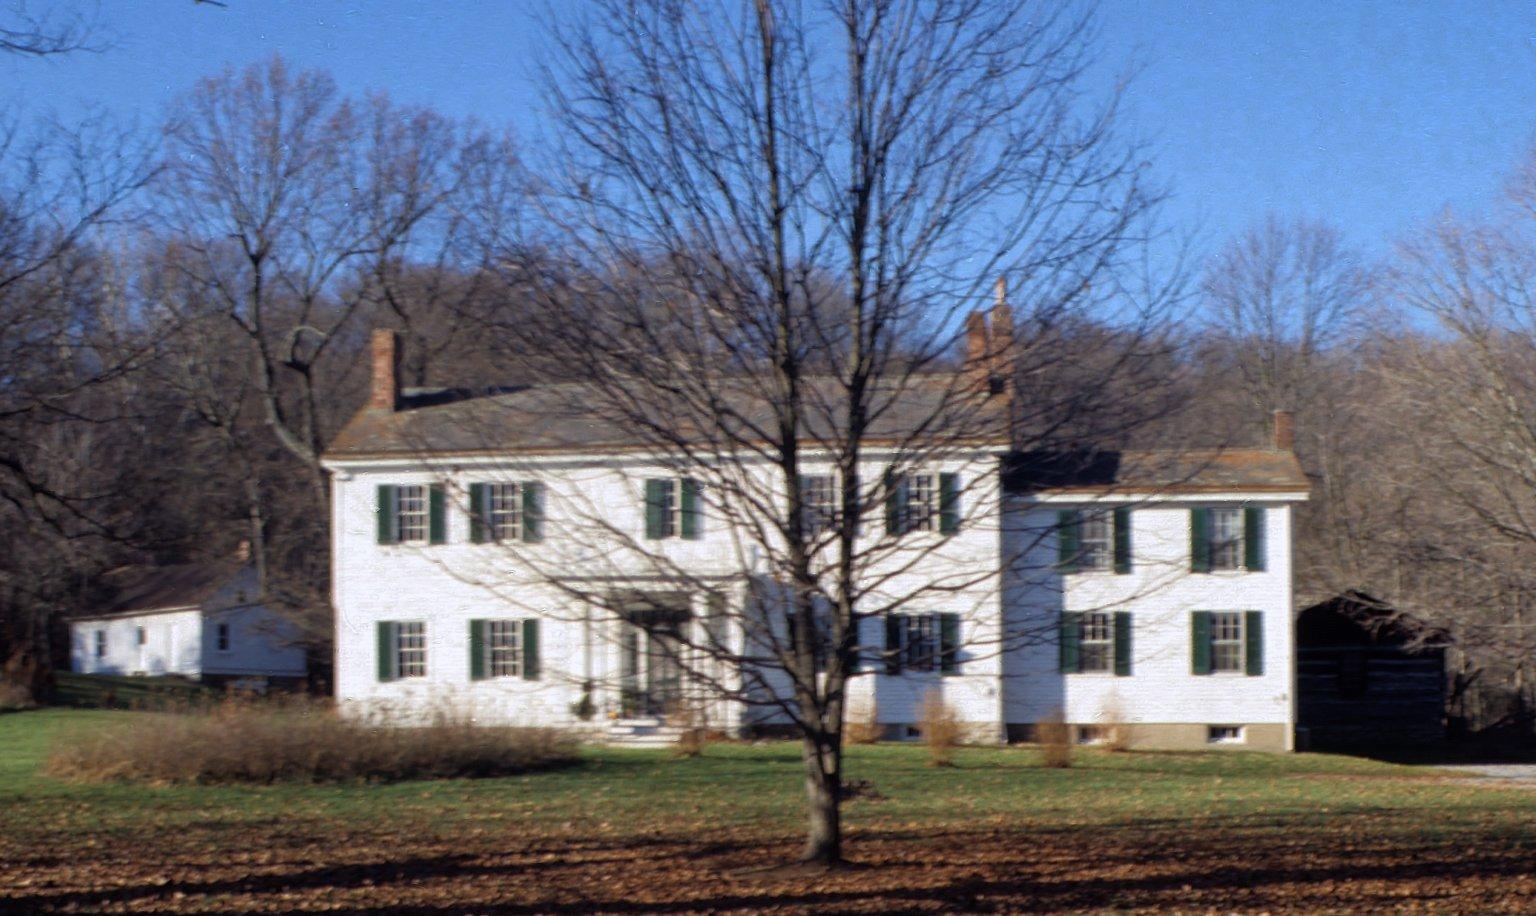 Dinsmore Homestead